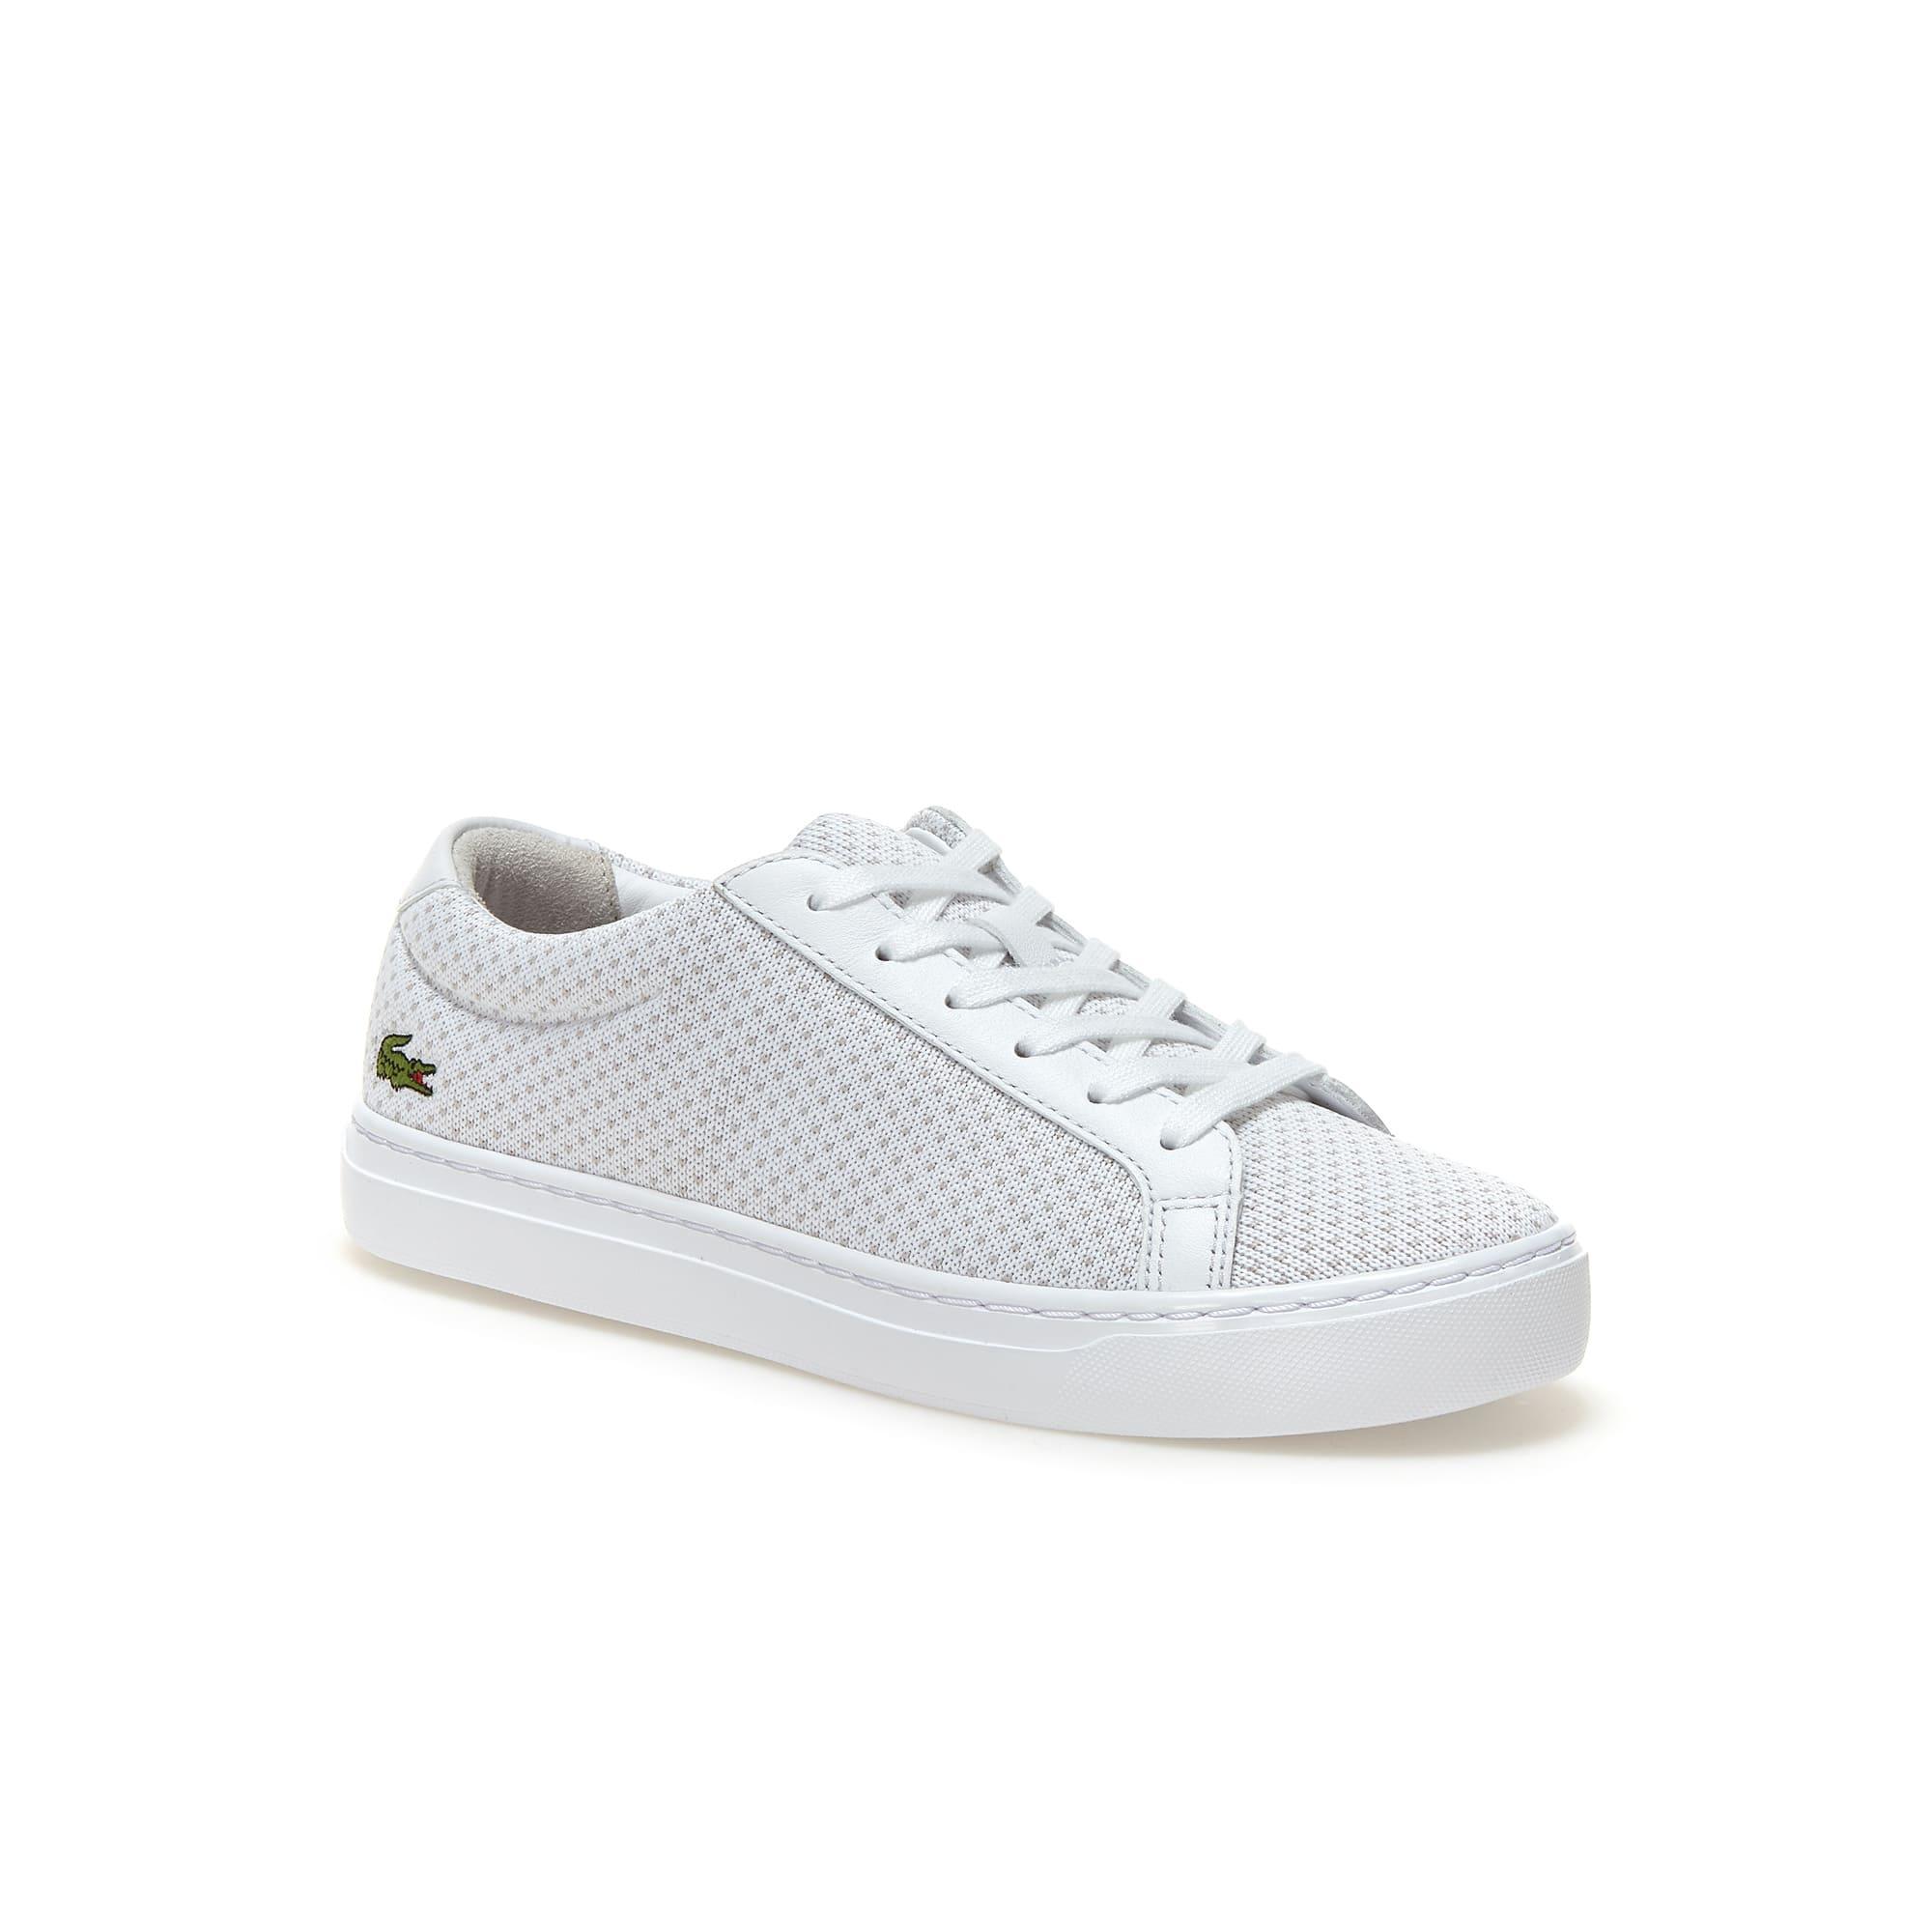 Sneakers L.12.12 Lightweight en textile léger